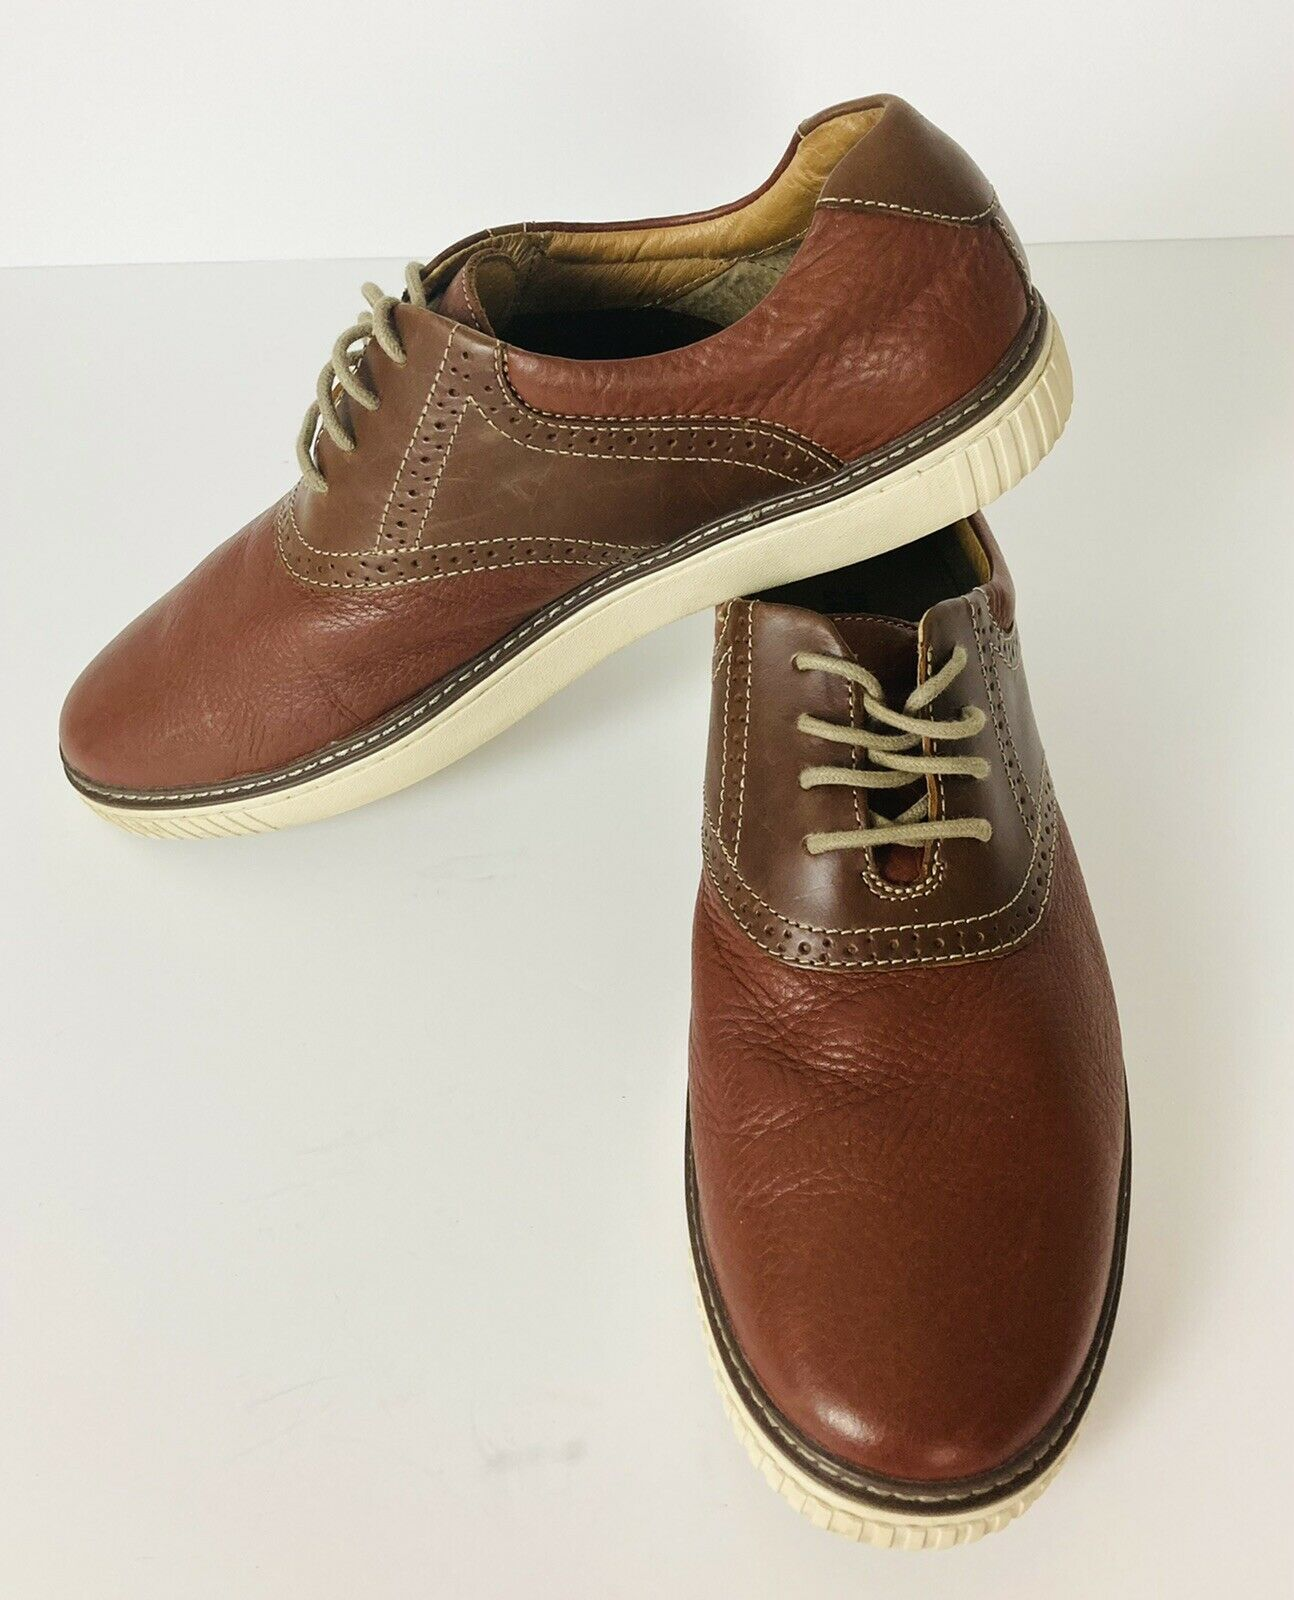 Johnston & Murphy 25-8396 Sheepskin Men's shoes size 12M Brown